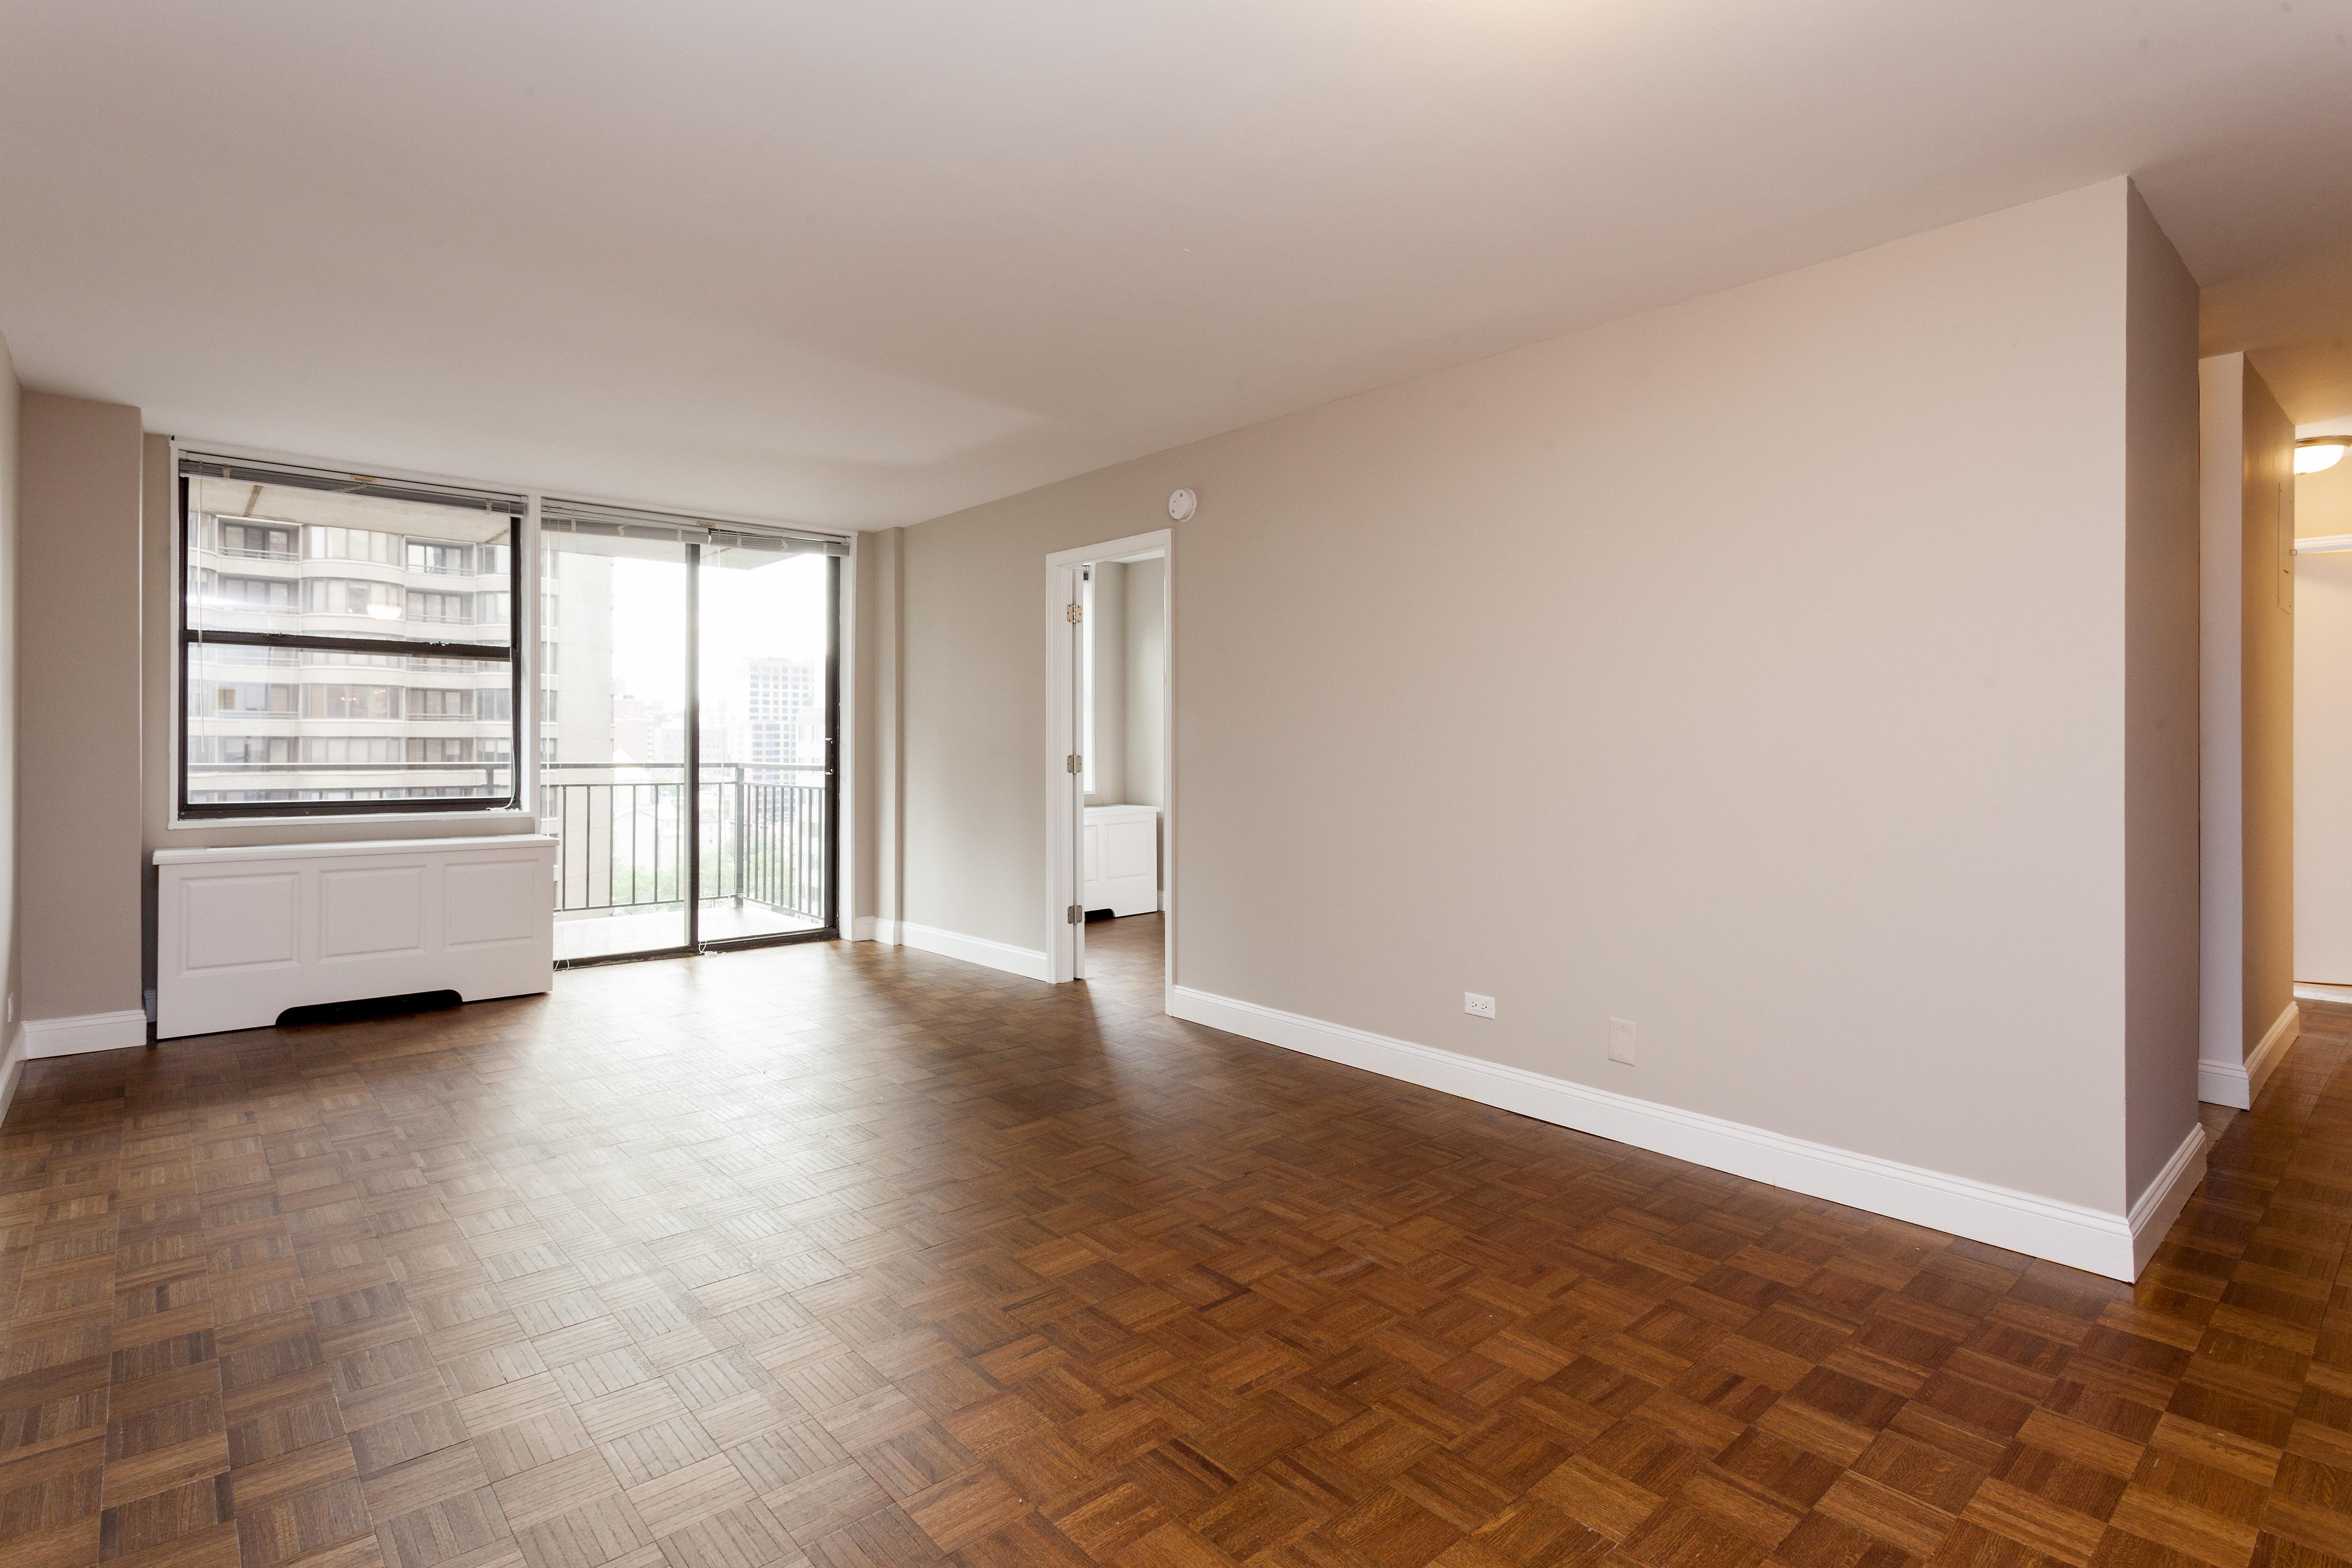 330 East 39th Street, Apt 11C, Manhattan, New York 10016